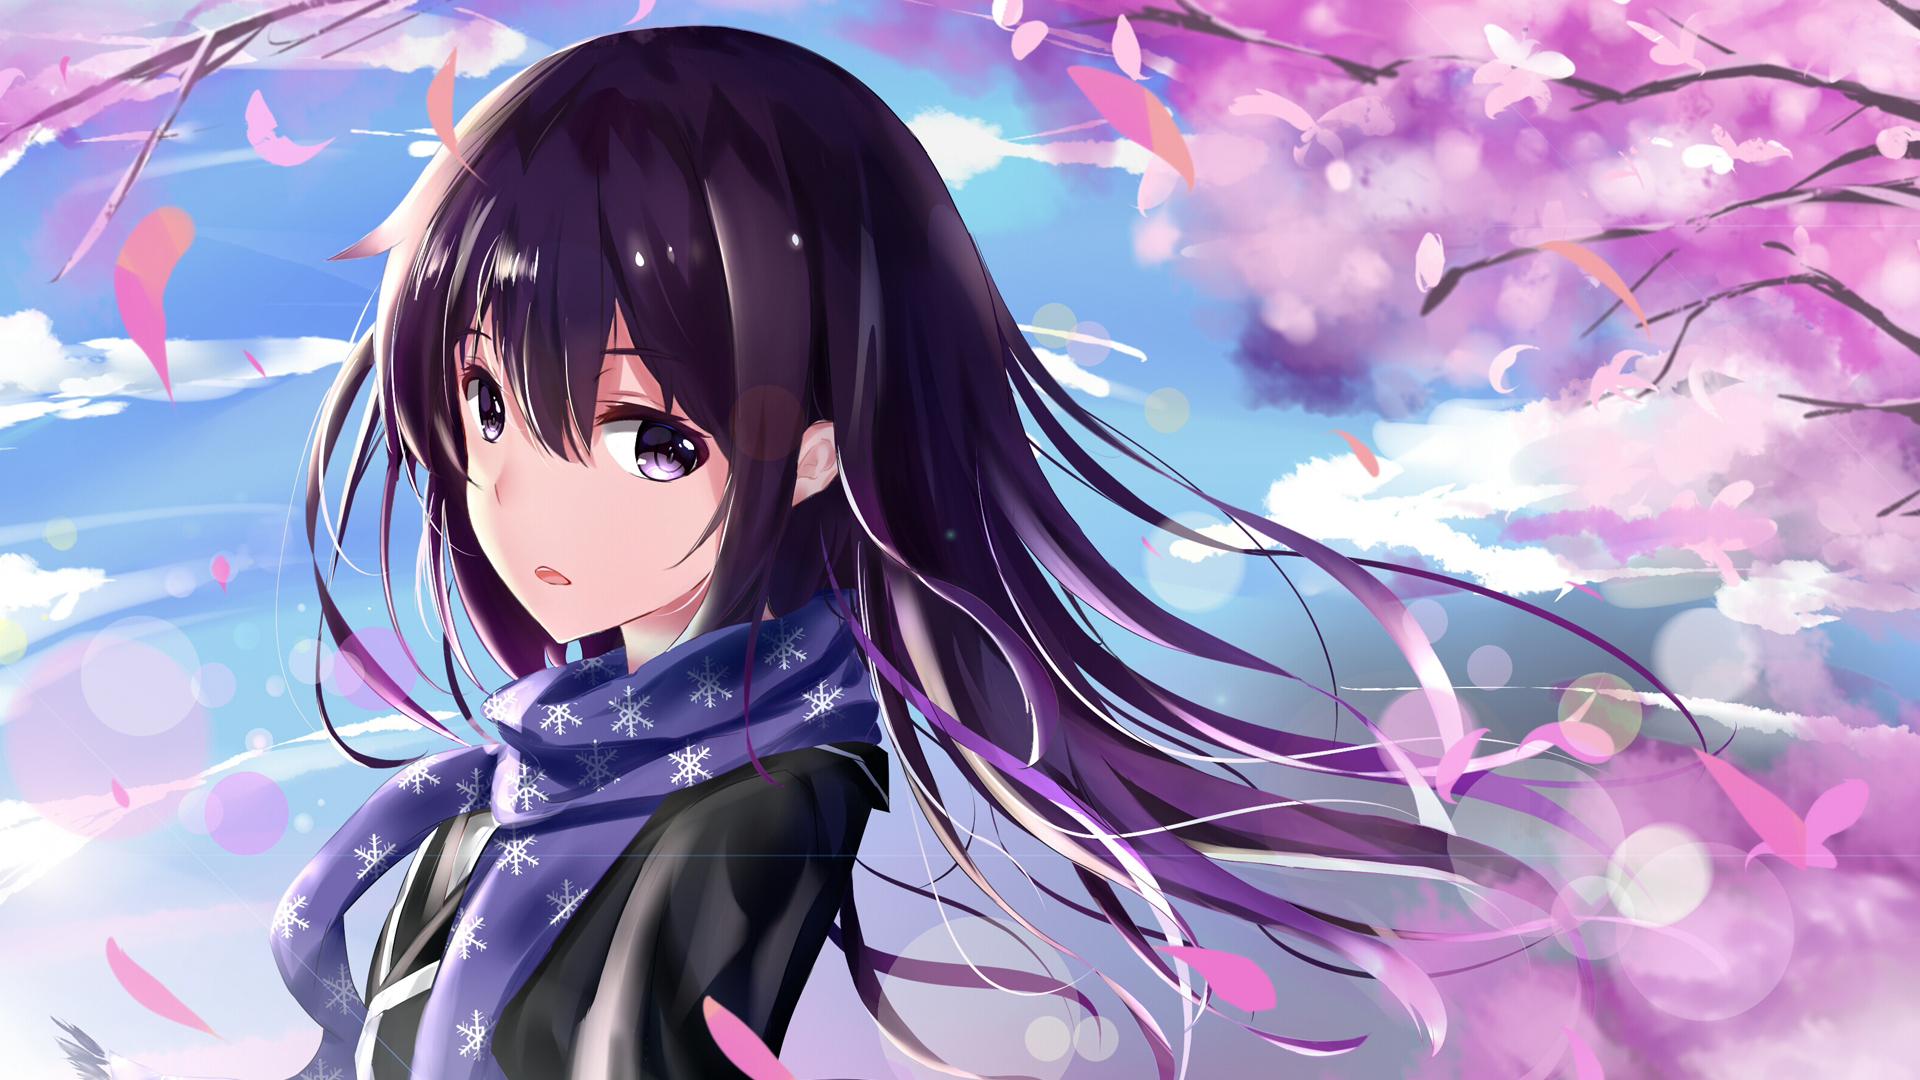 Blossom Girl Long Hair Purple Eyes Purple Hair Scarf Yukino Yukinoshita 1920x1080